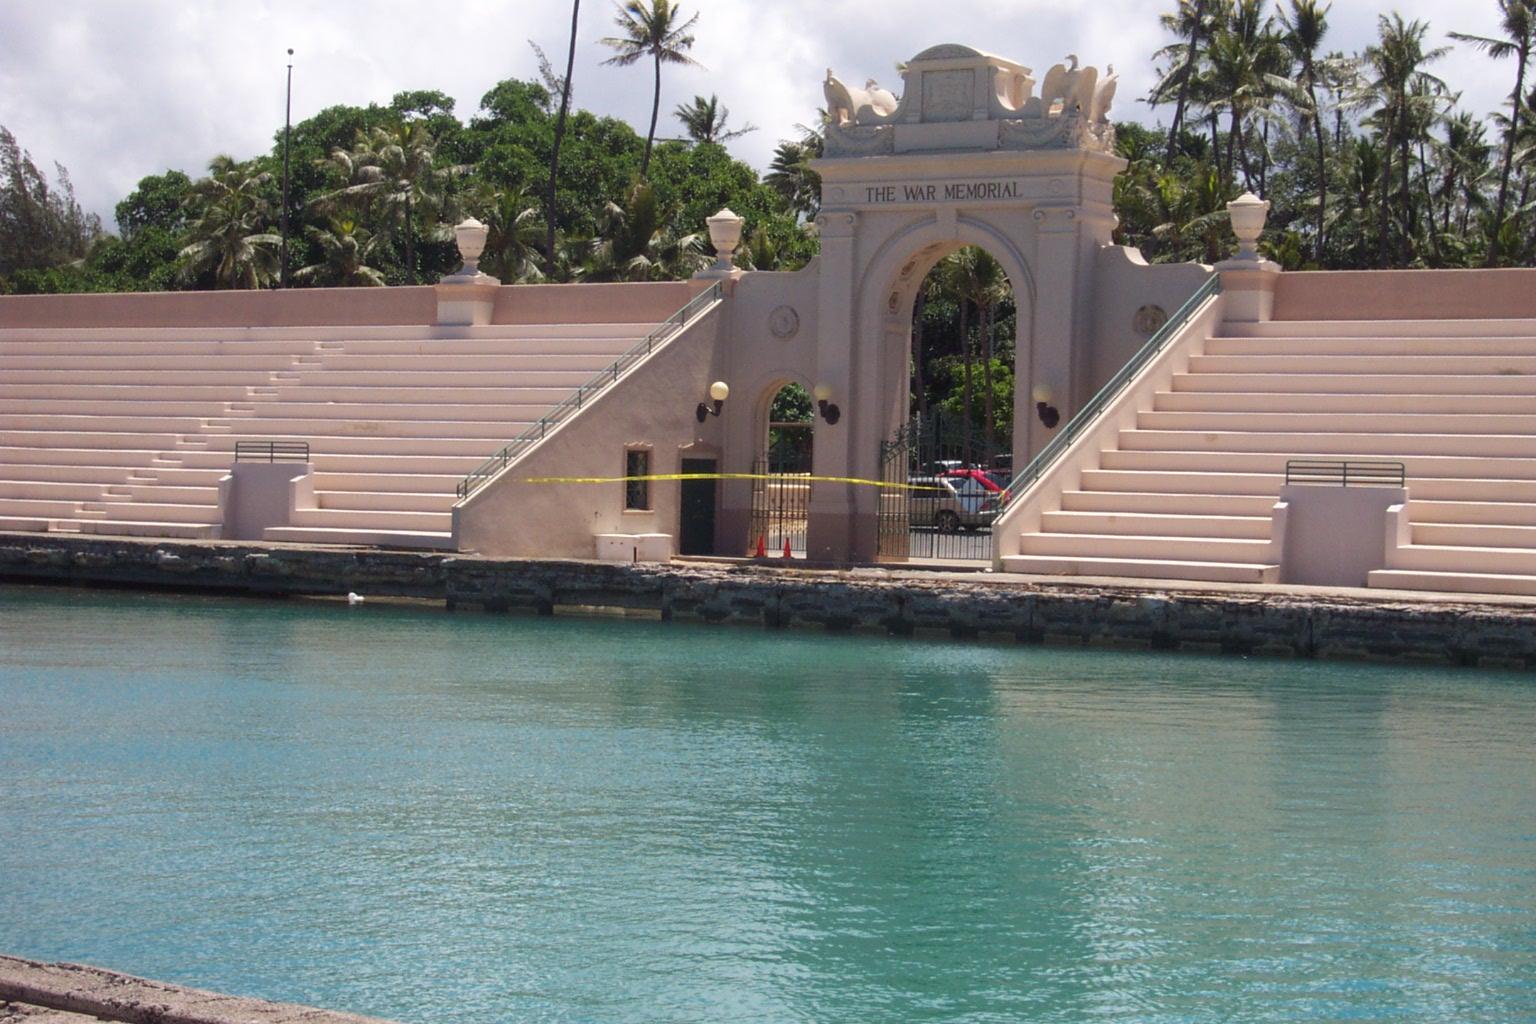 Waikiki Natatorium War Memorial - Wikipedia